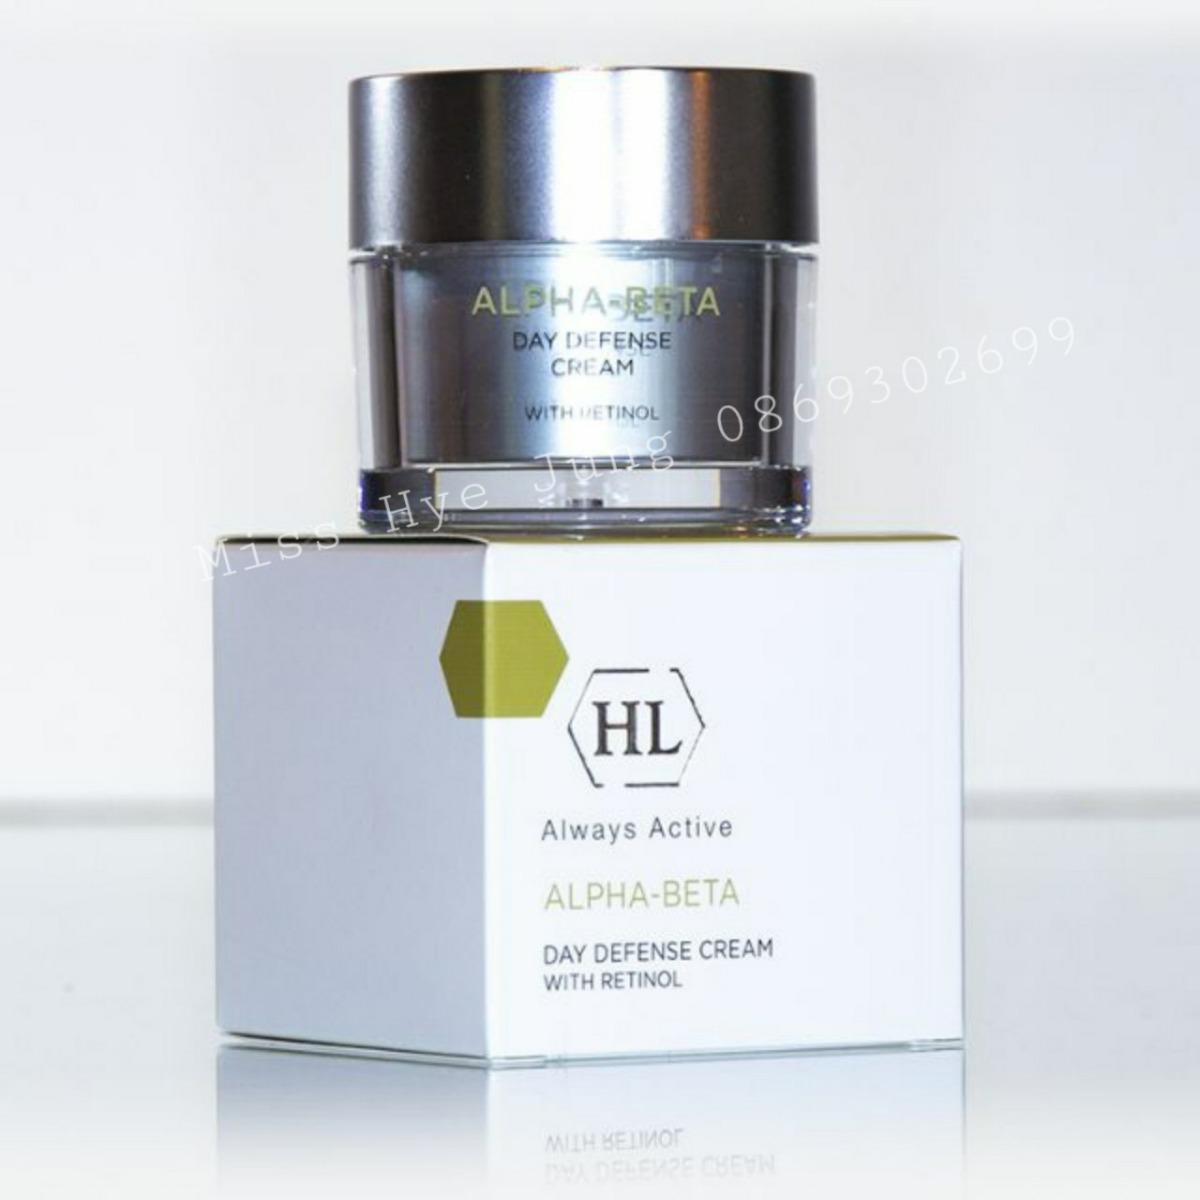 Kem trẻ hóa ban ngày HL Alpha-Beta Day Defense Cream with Retinol 50ml